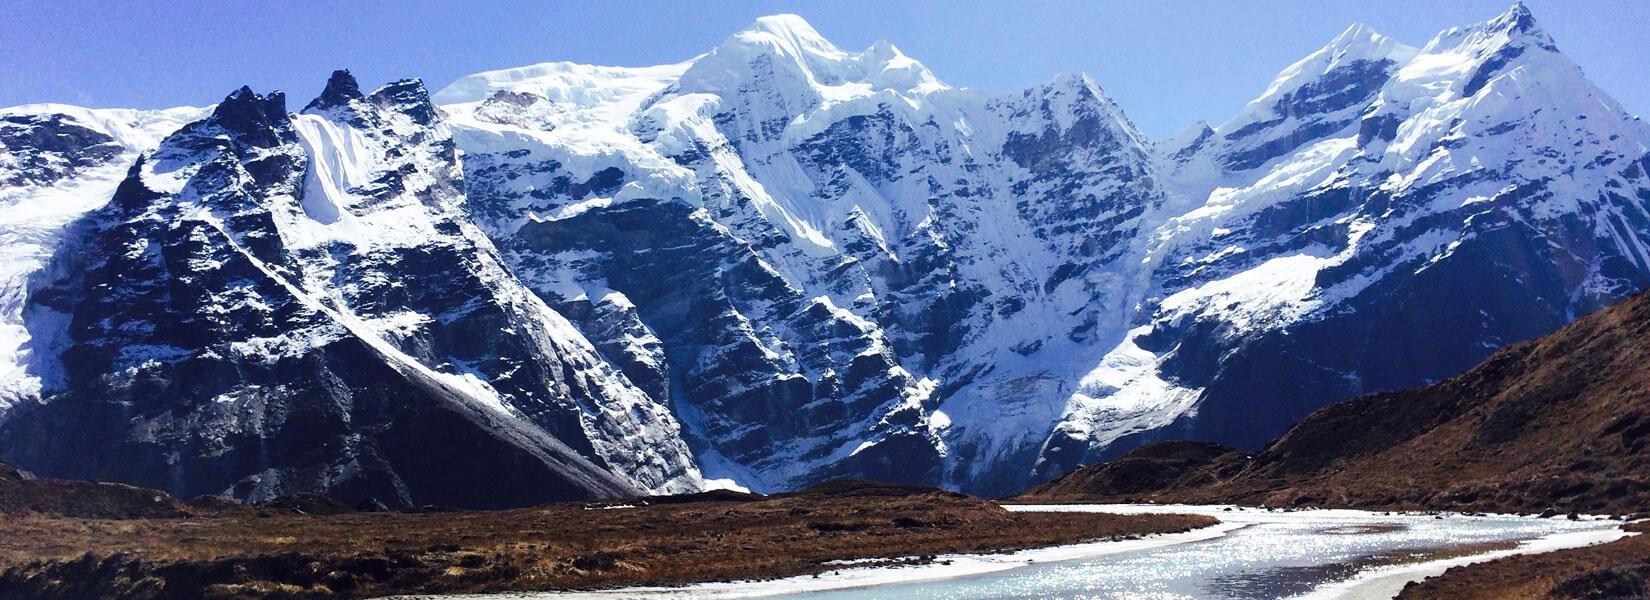 Short Mera Peak Climbing